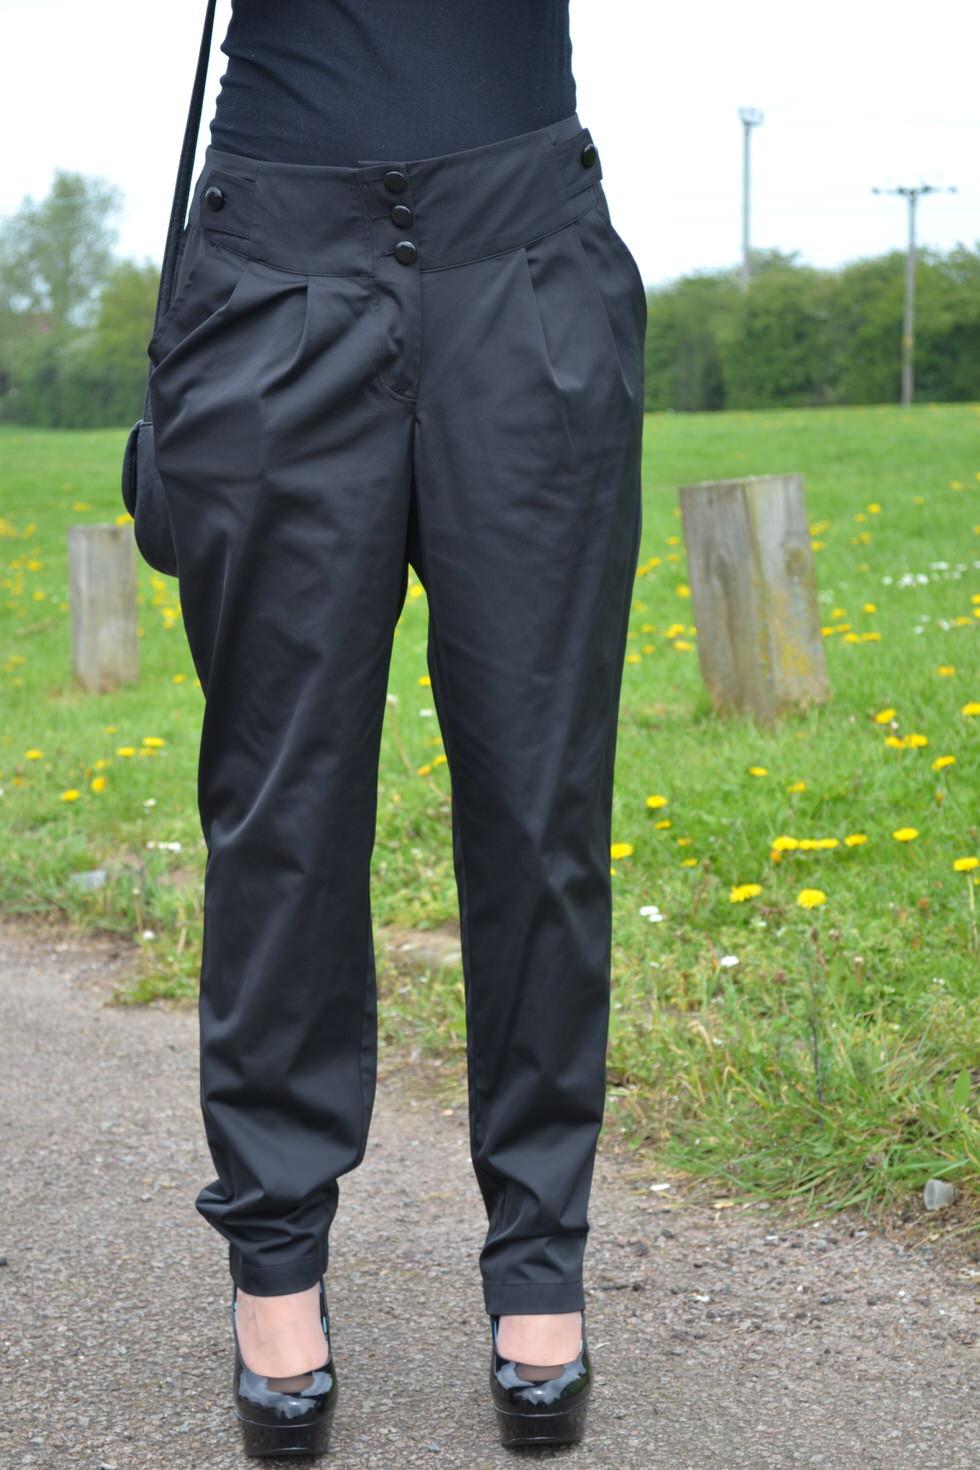 Fashion Outfits - All Black